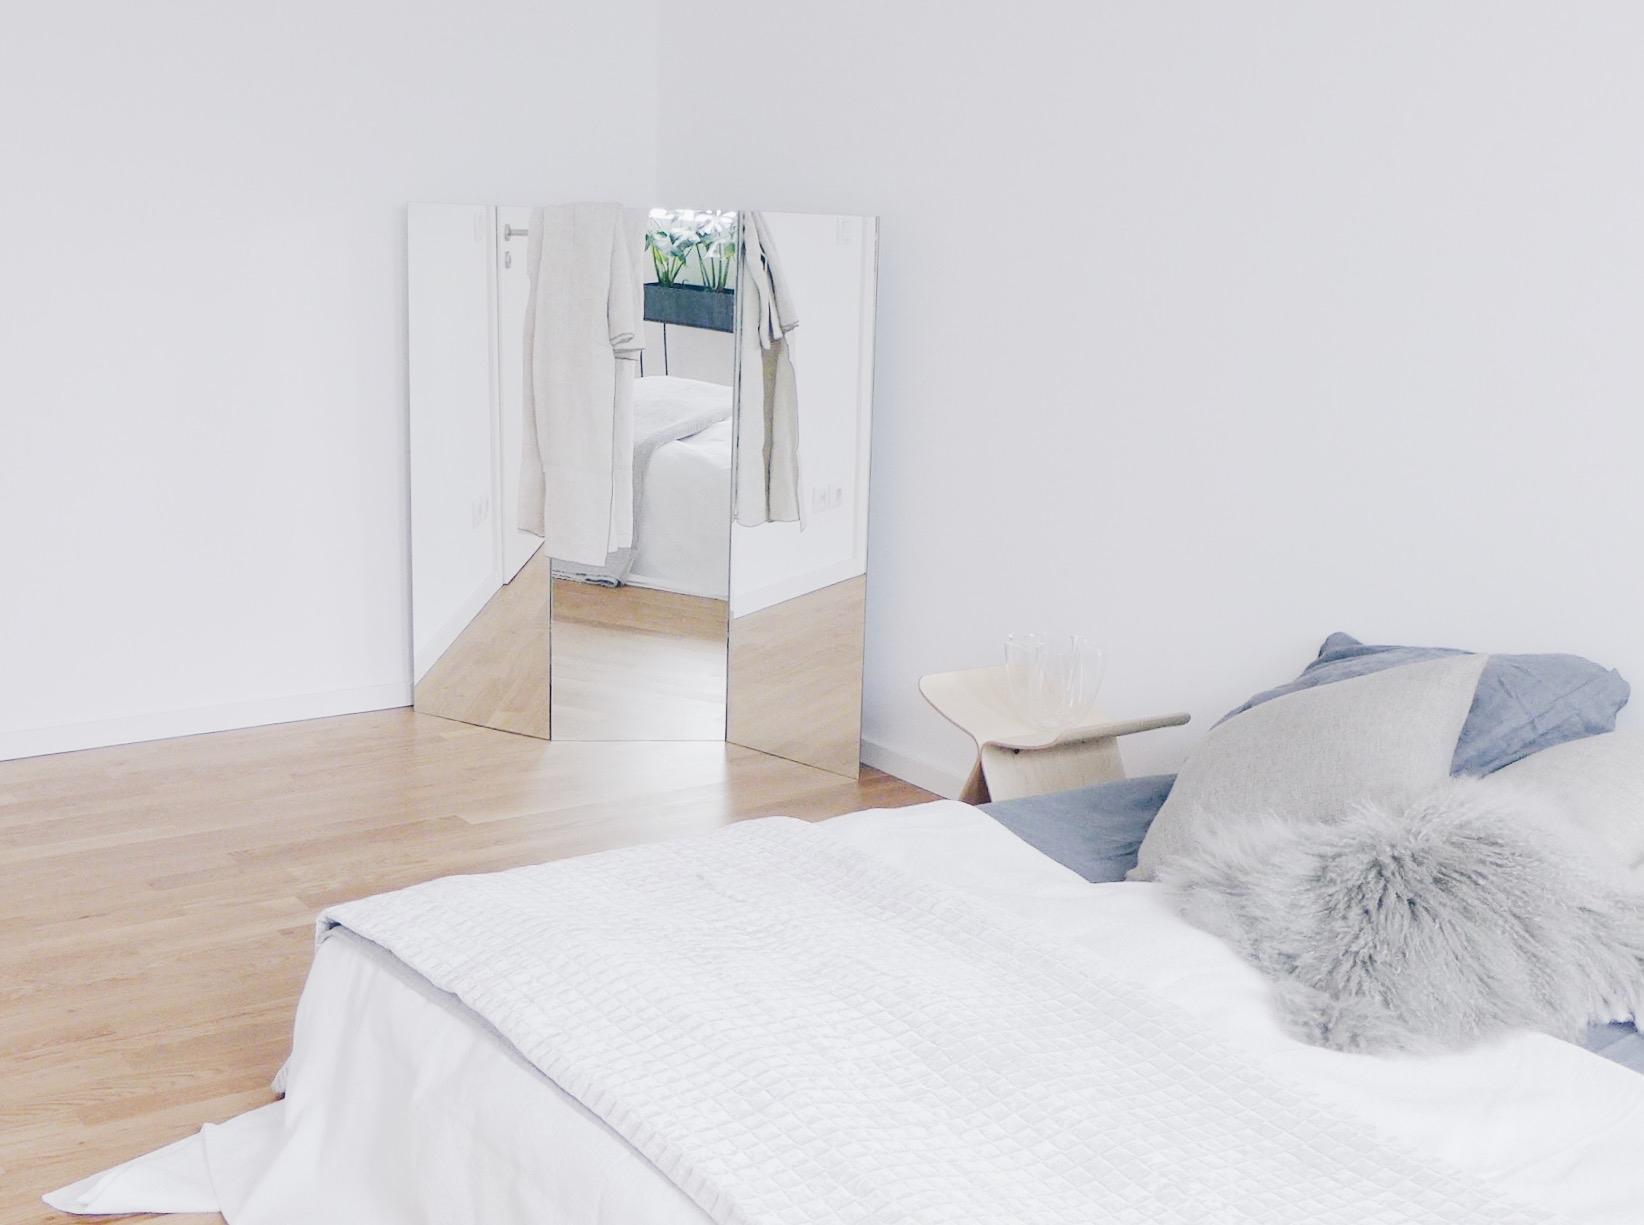 diy mirror paravent amazed. Black Bedroom Furniture Sets. Home Design Ideas